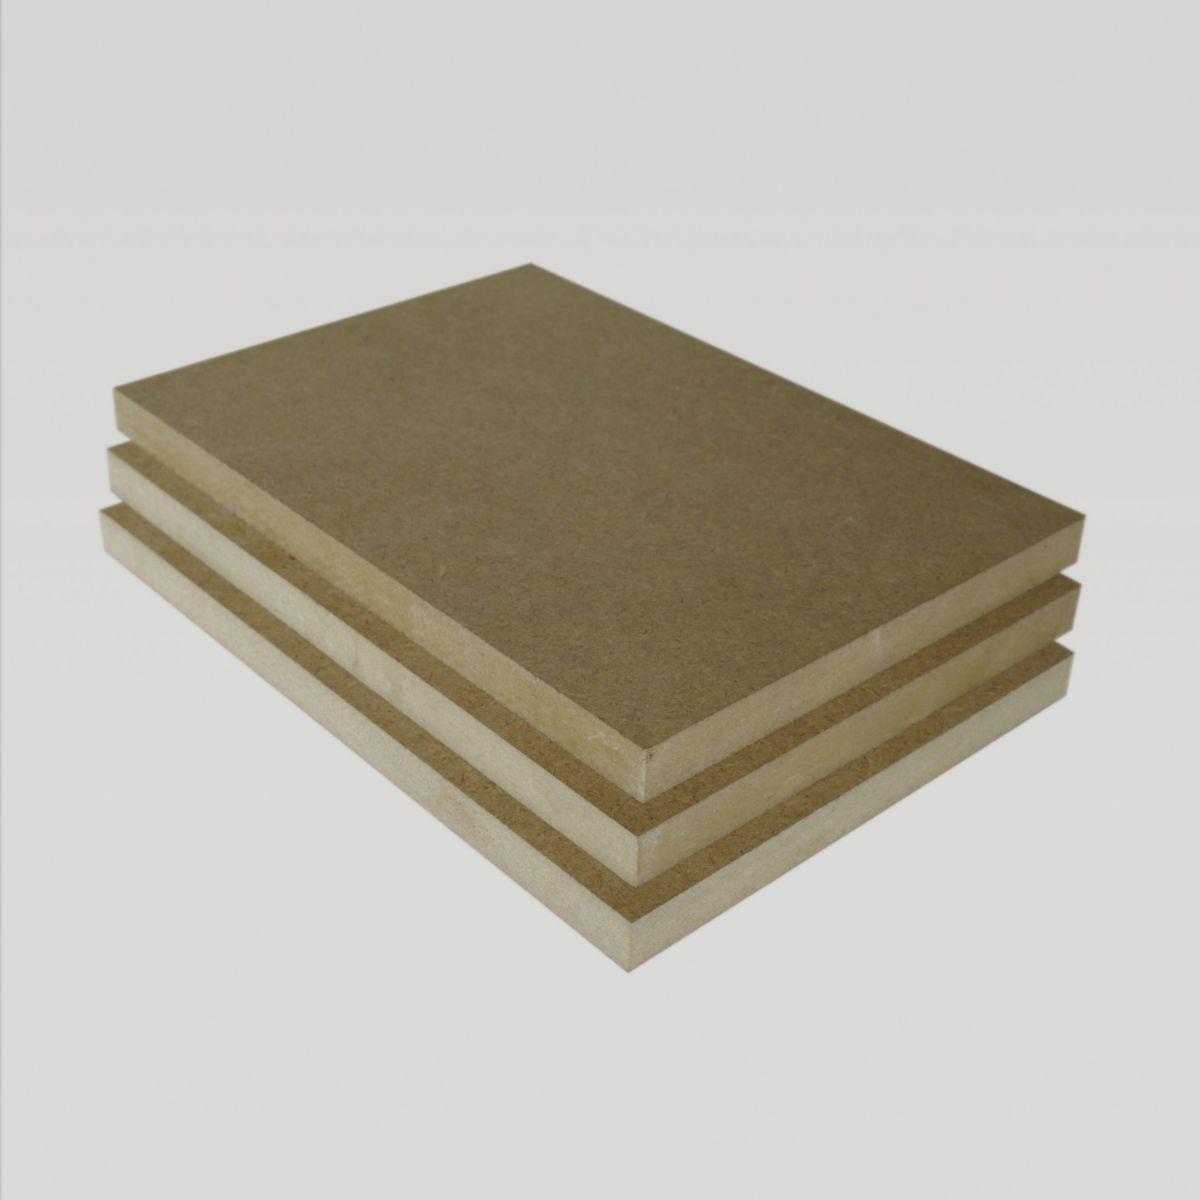 panneaux de correze panneau mdf medium isoroy standard. Black Bedroom Furniture Sets. Home Design Ideas